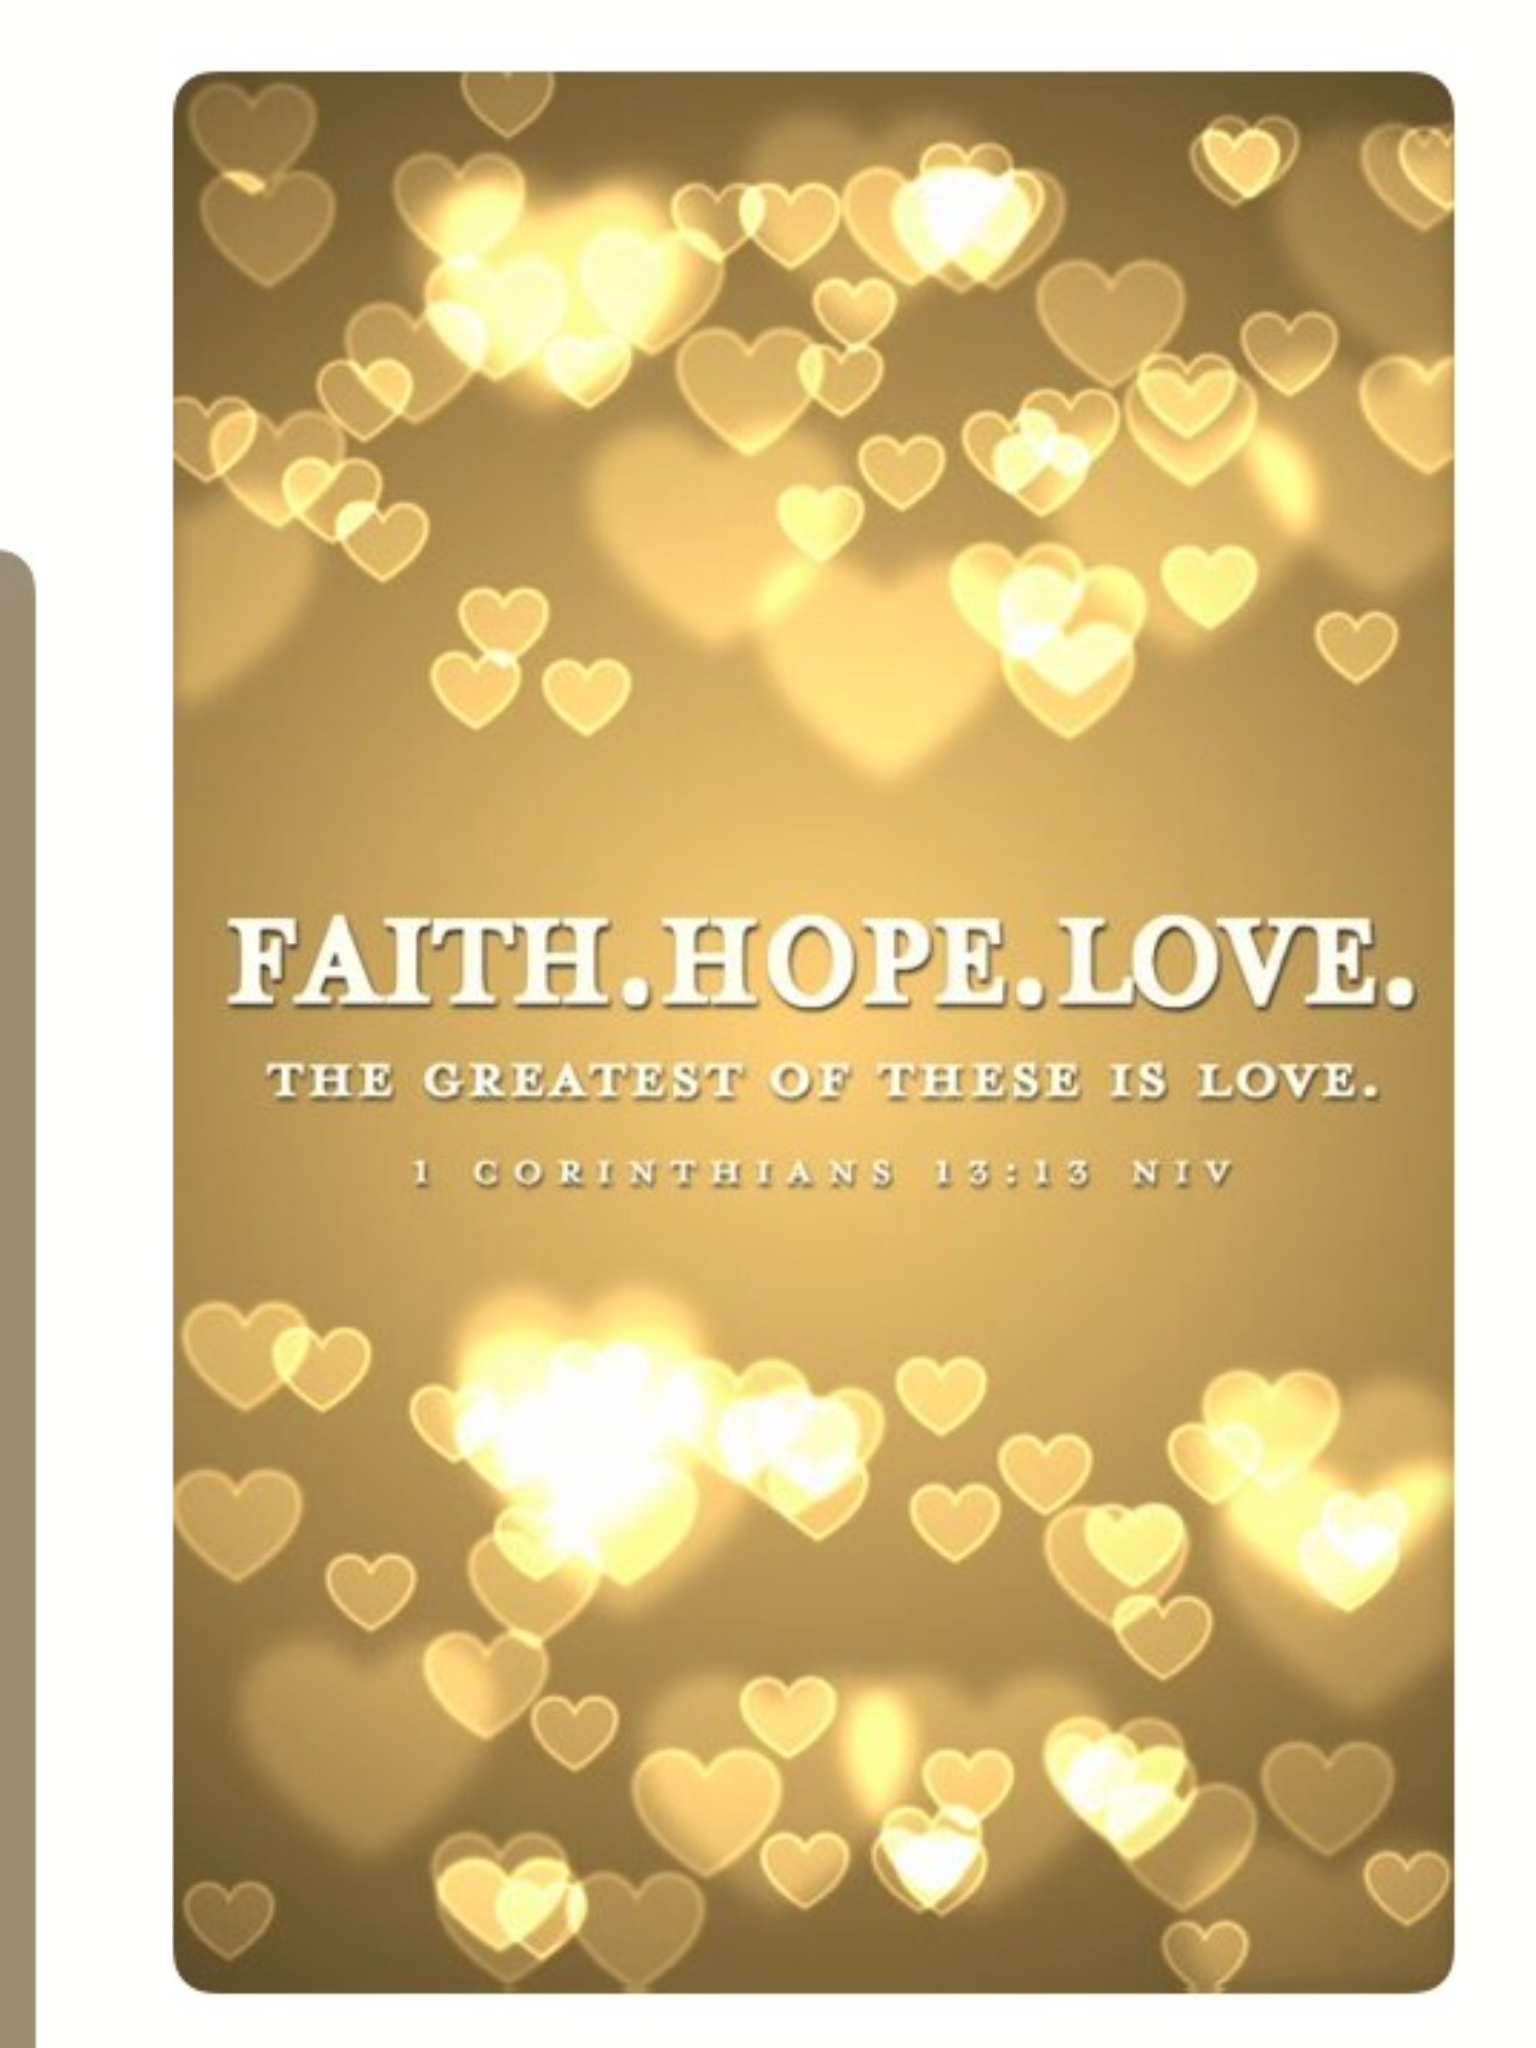 1 Corinthians 13:13 #love